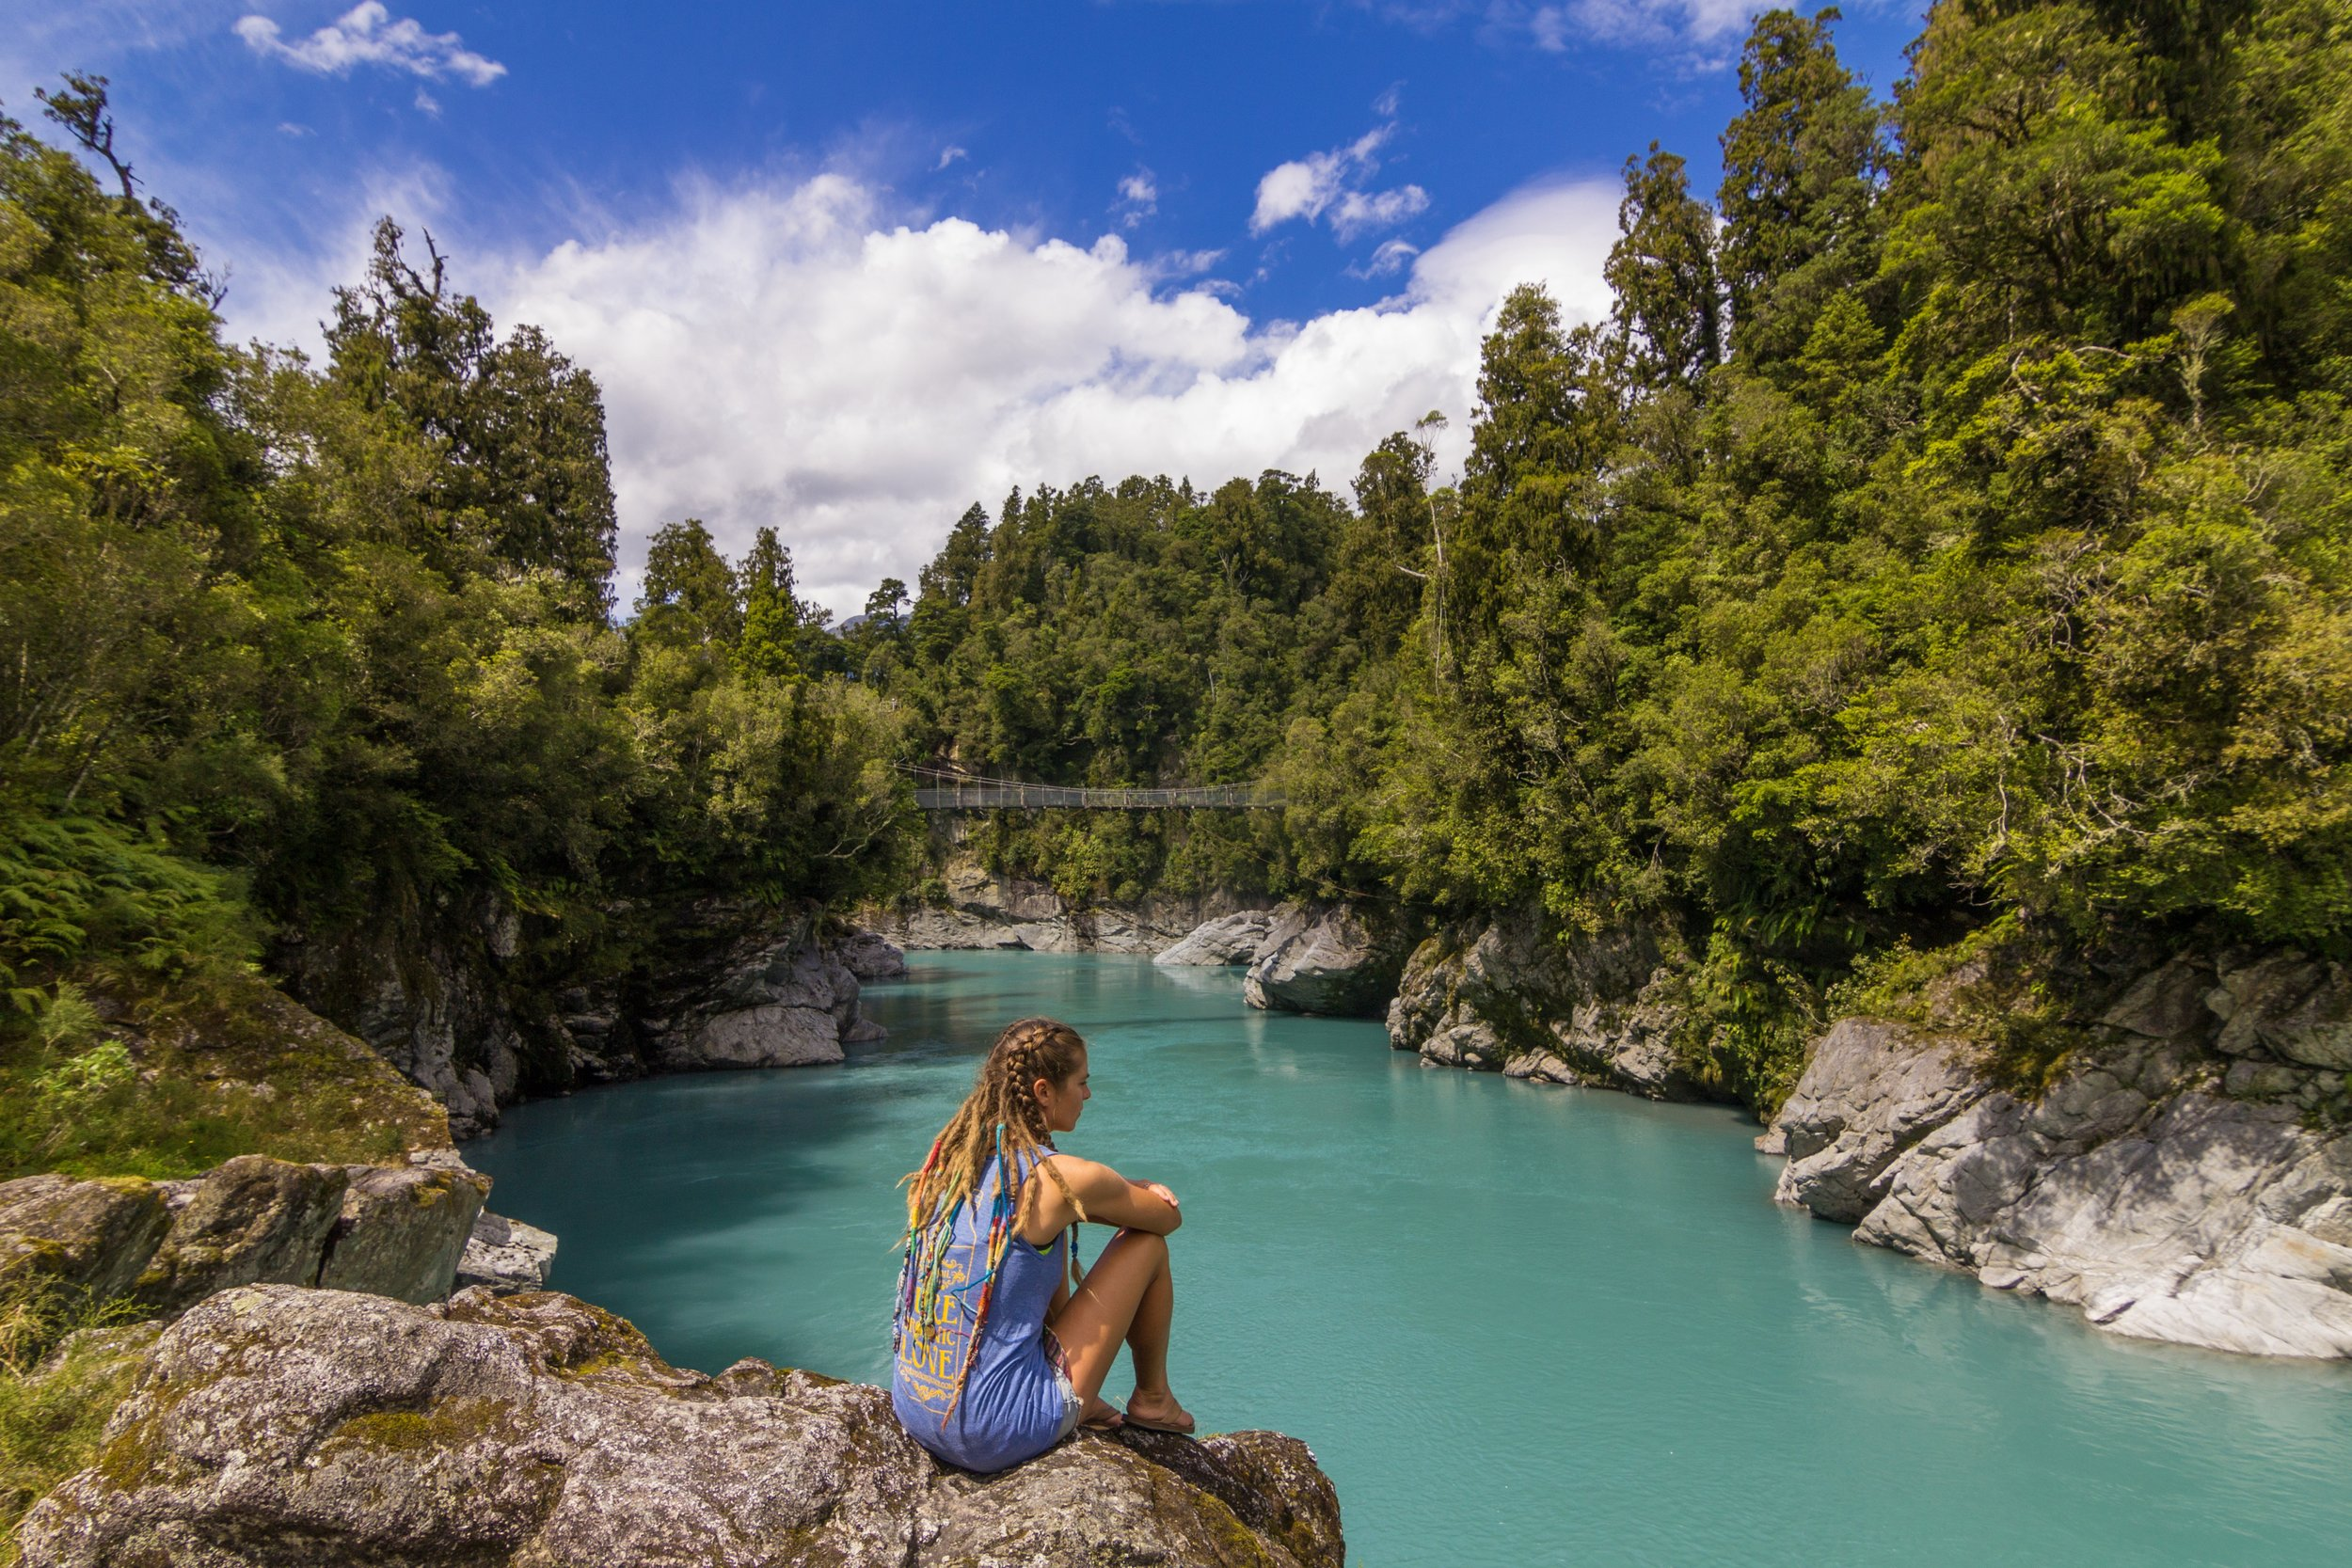 Hokkita Gorge New Zealand.JPG